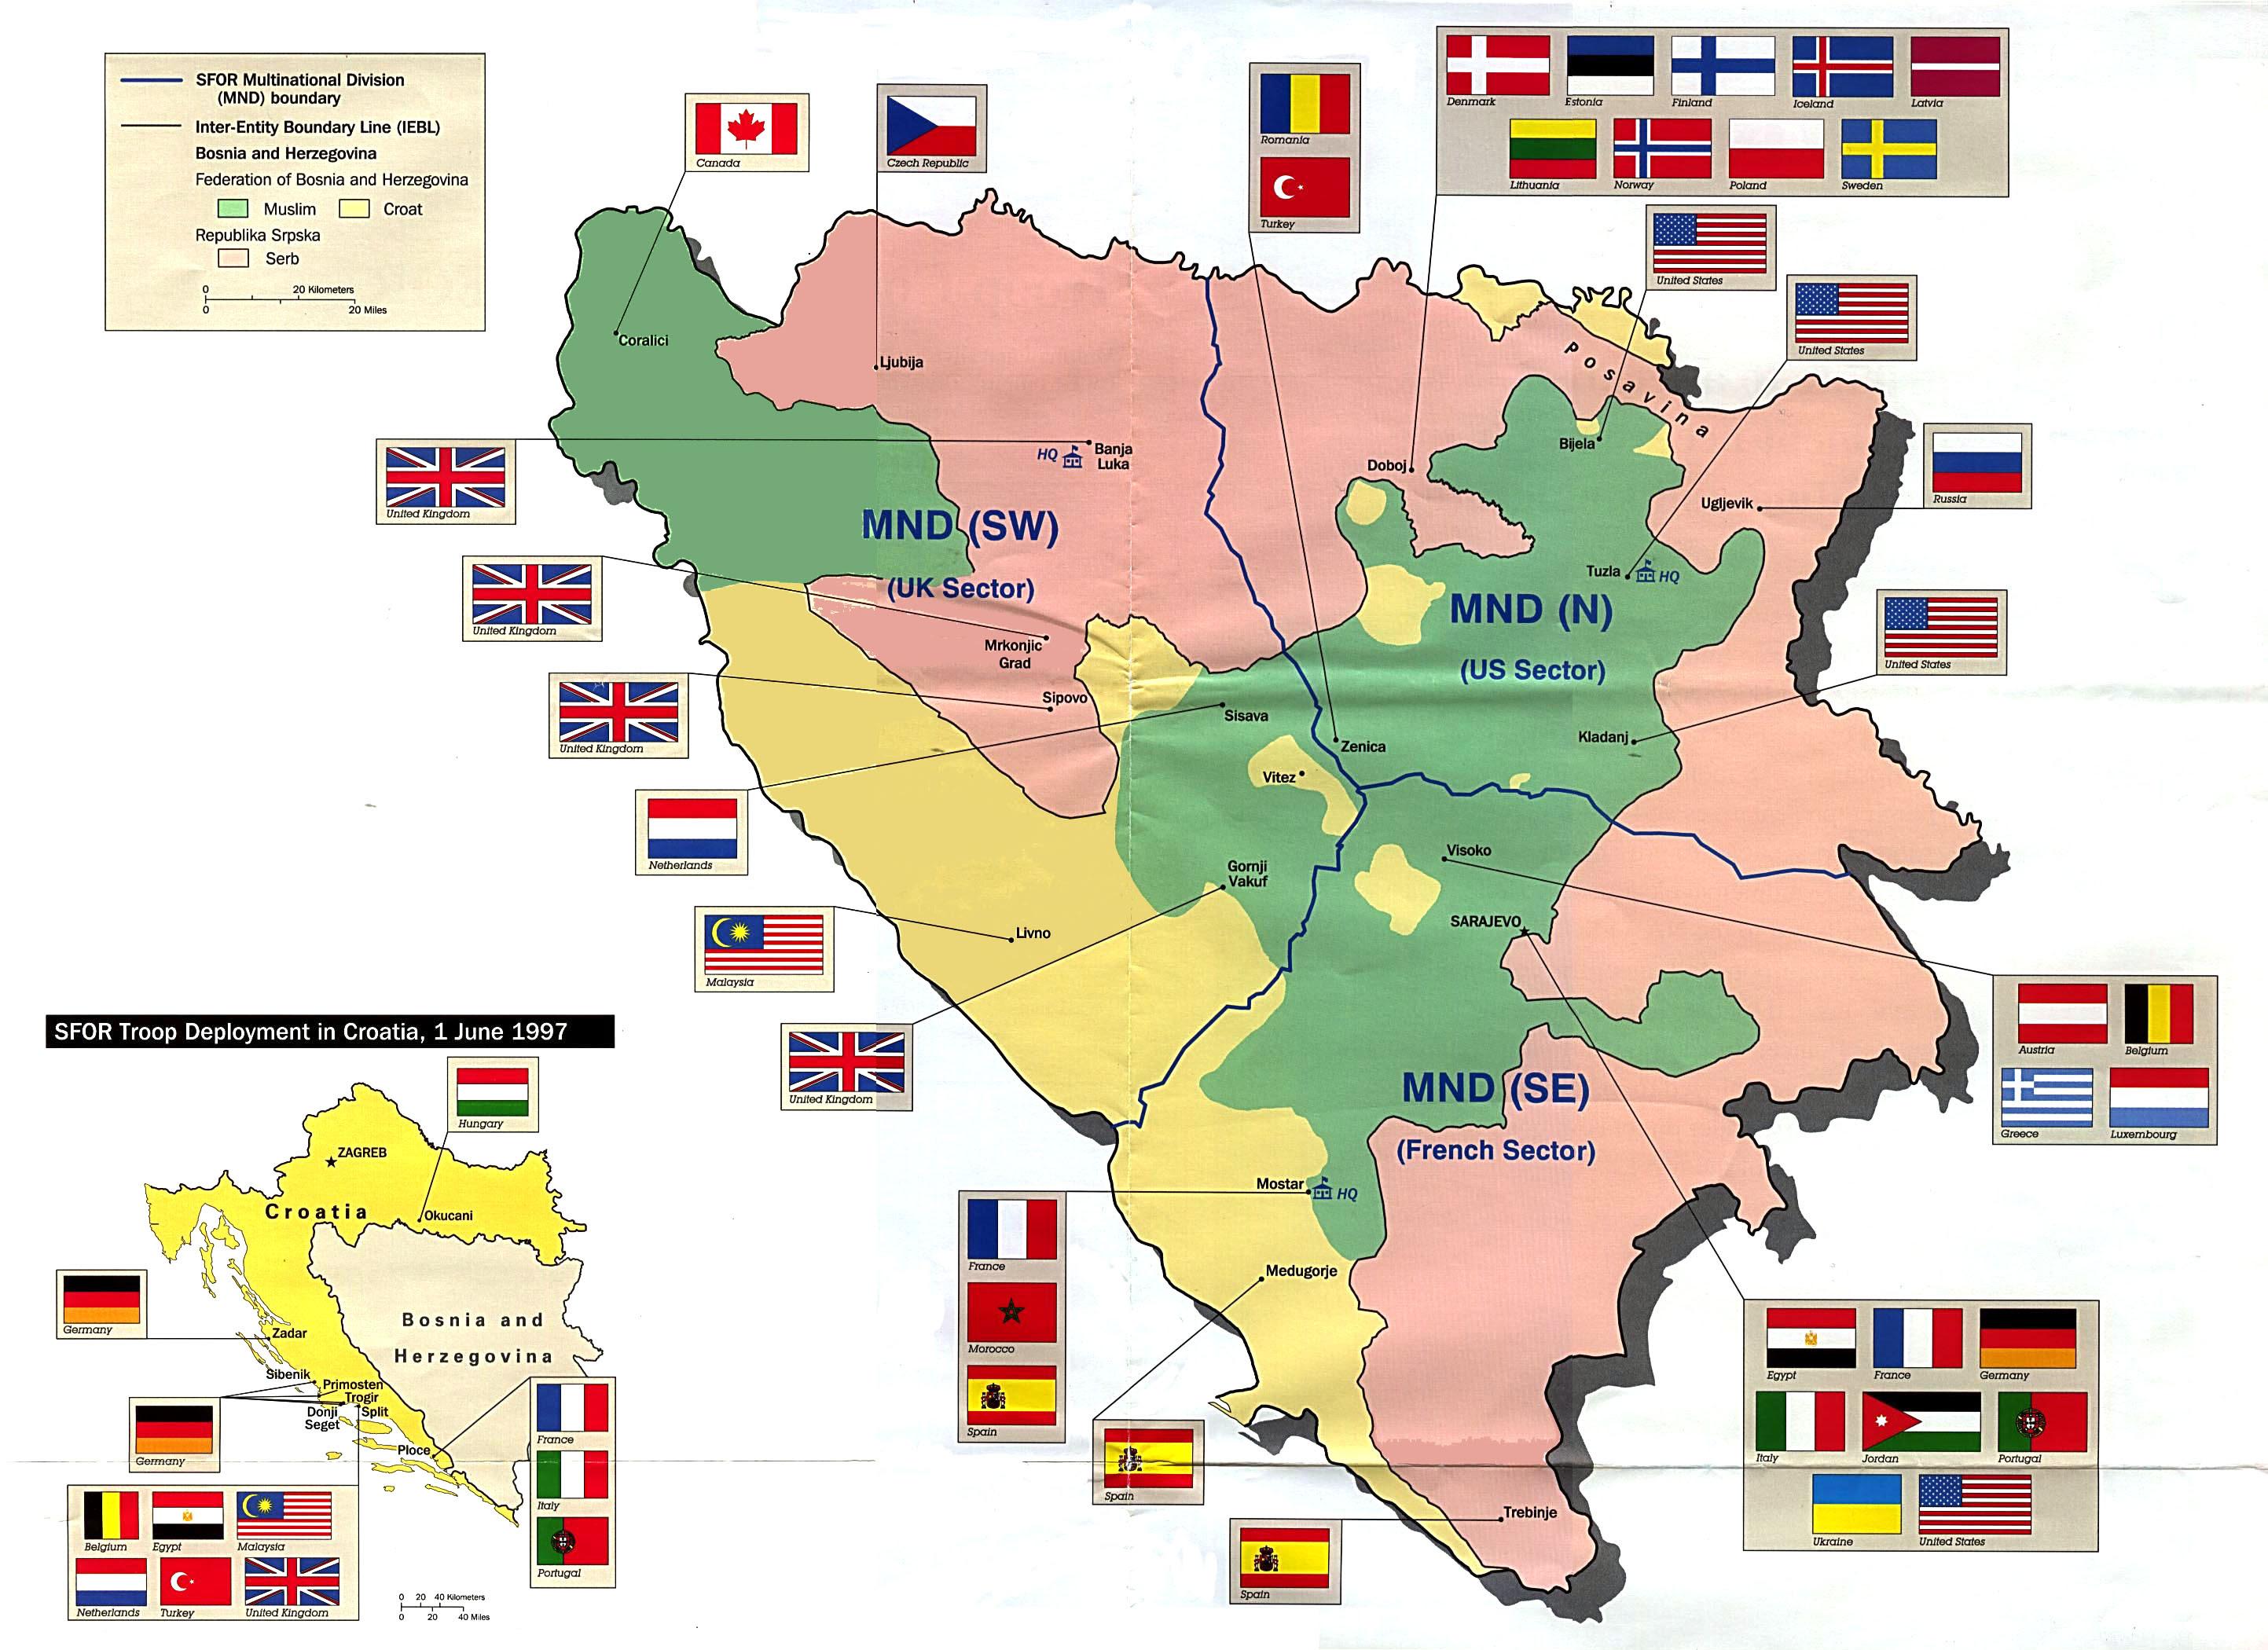 http://www.lib.utexas.edu/maps/bosnia/bosnia_sfortroop_97.jpg